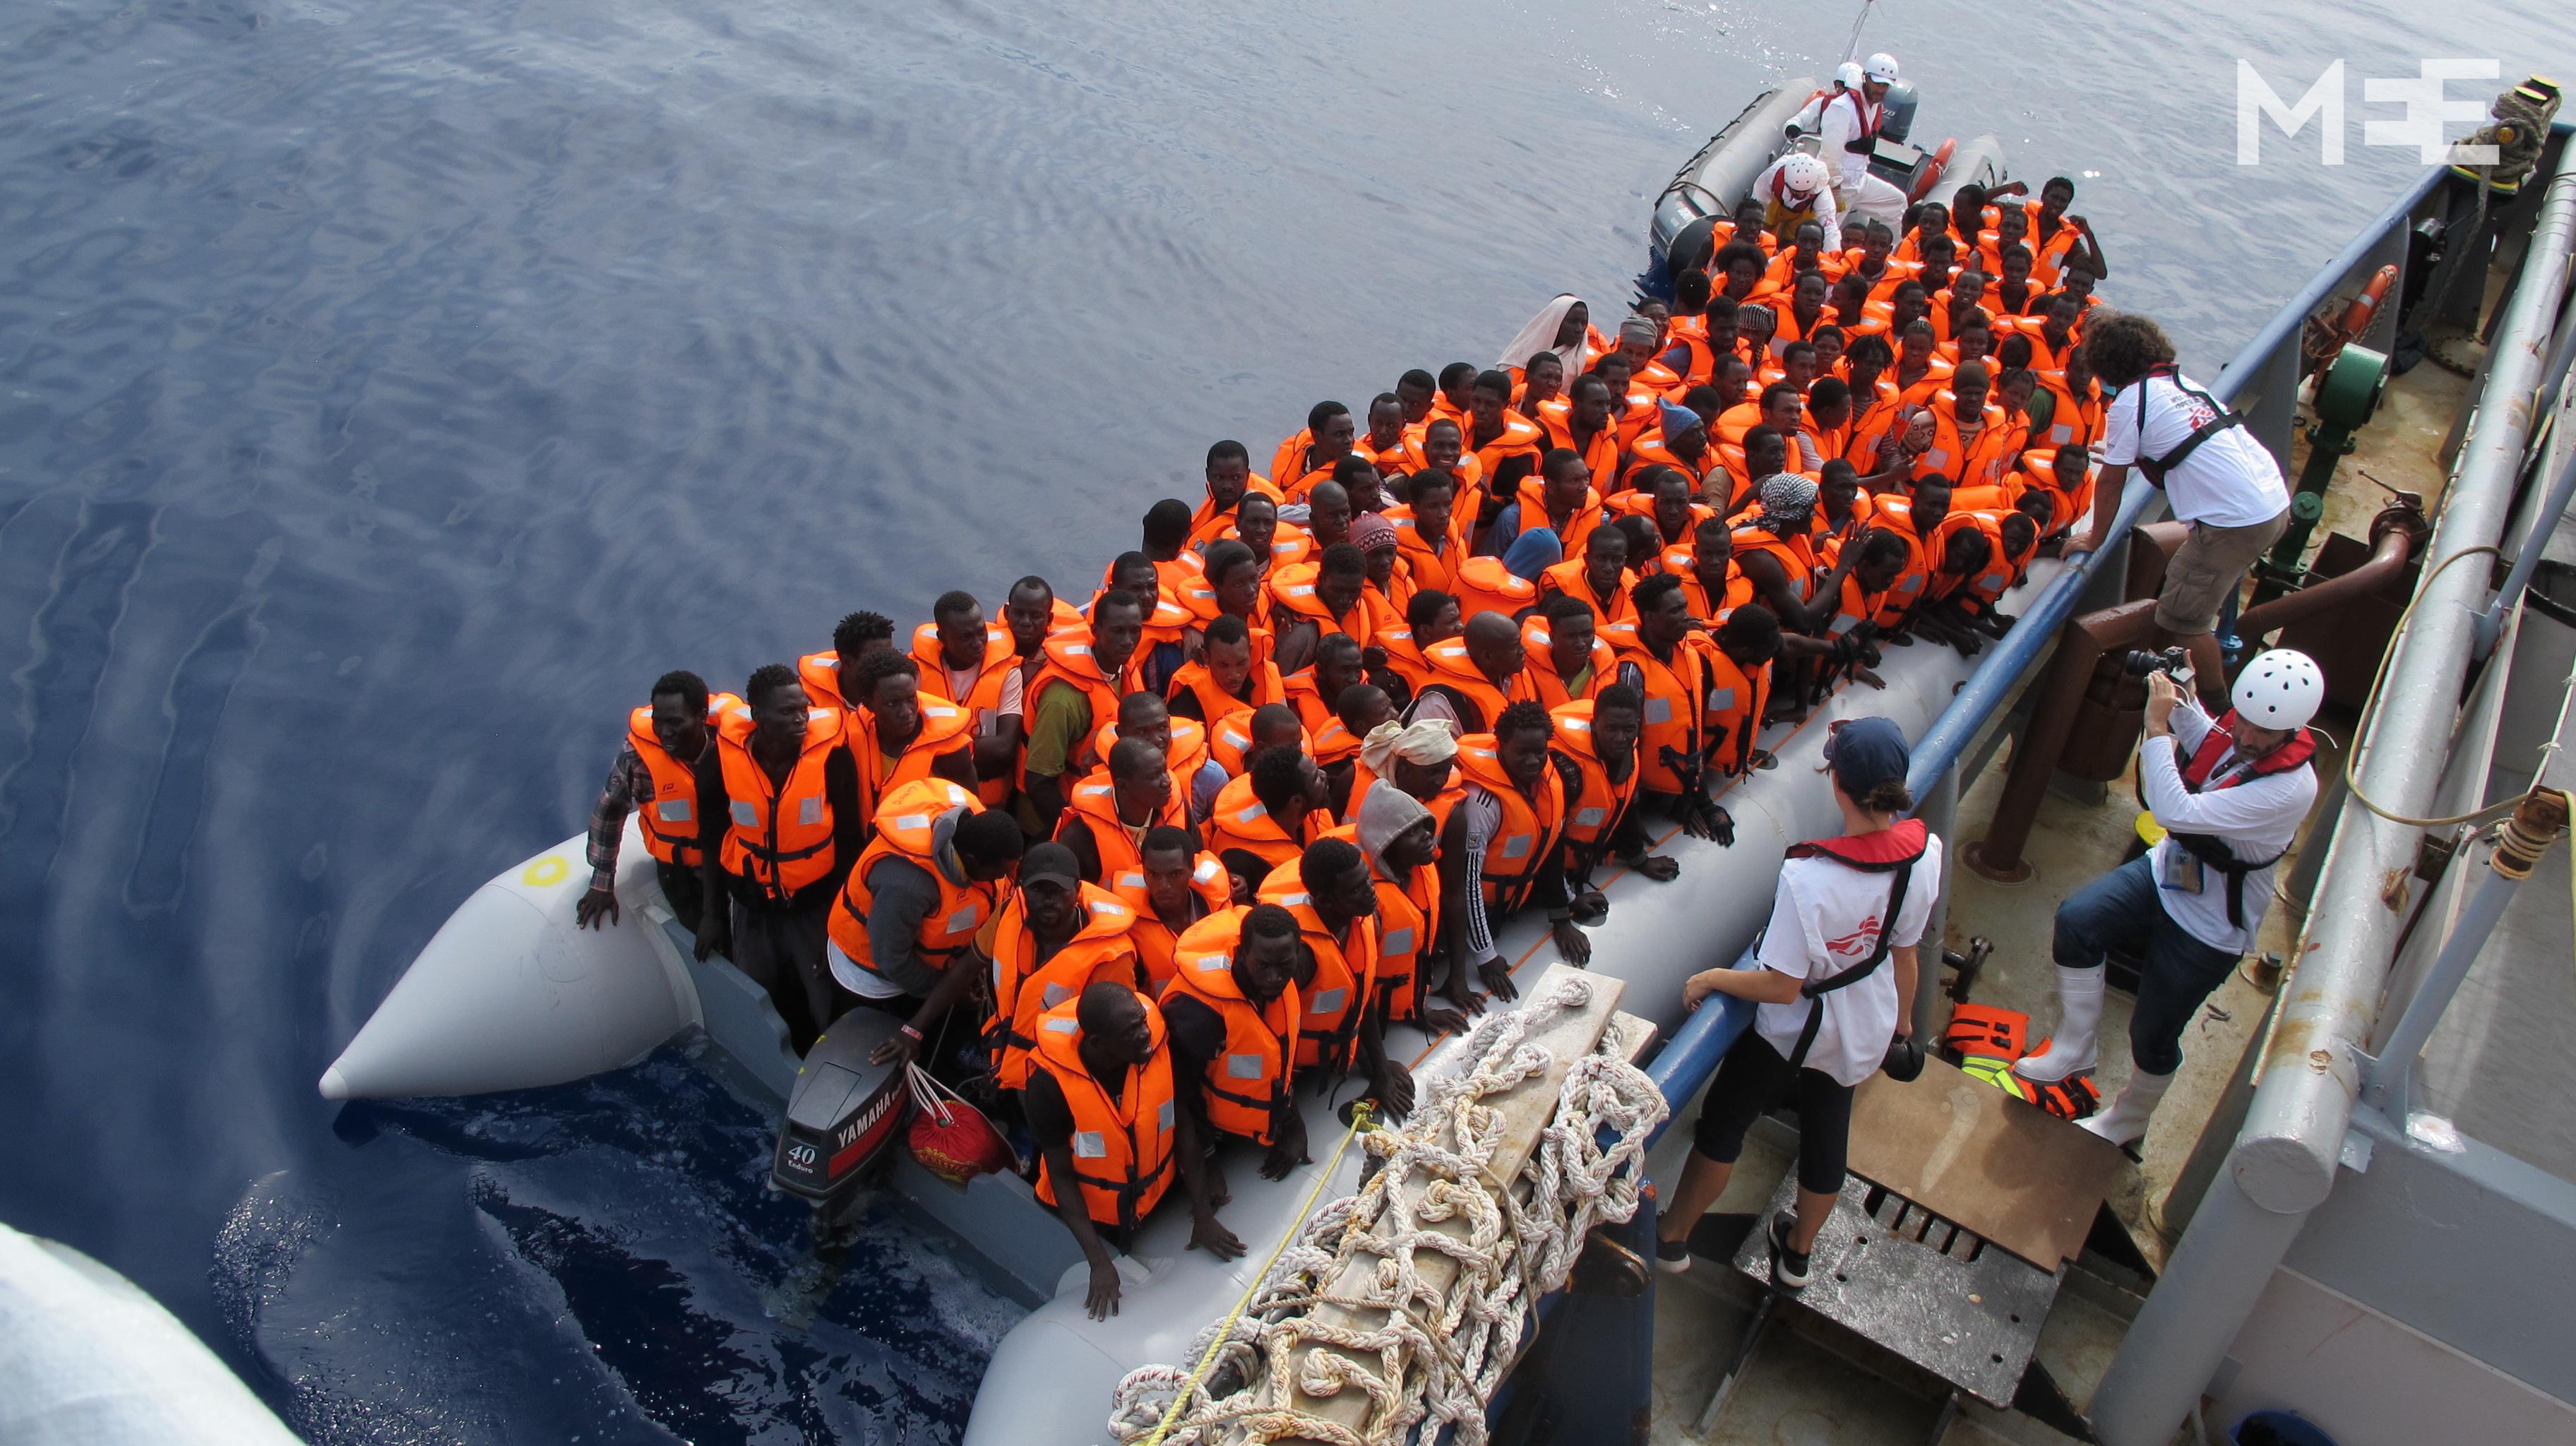 u0026 39 thank you for saving my life u0026 39   aboard a refugee rescue